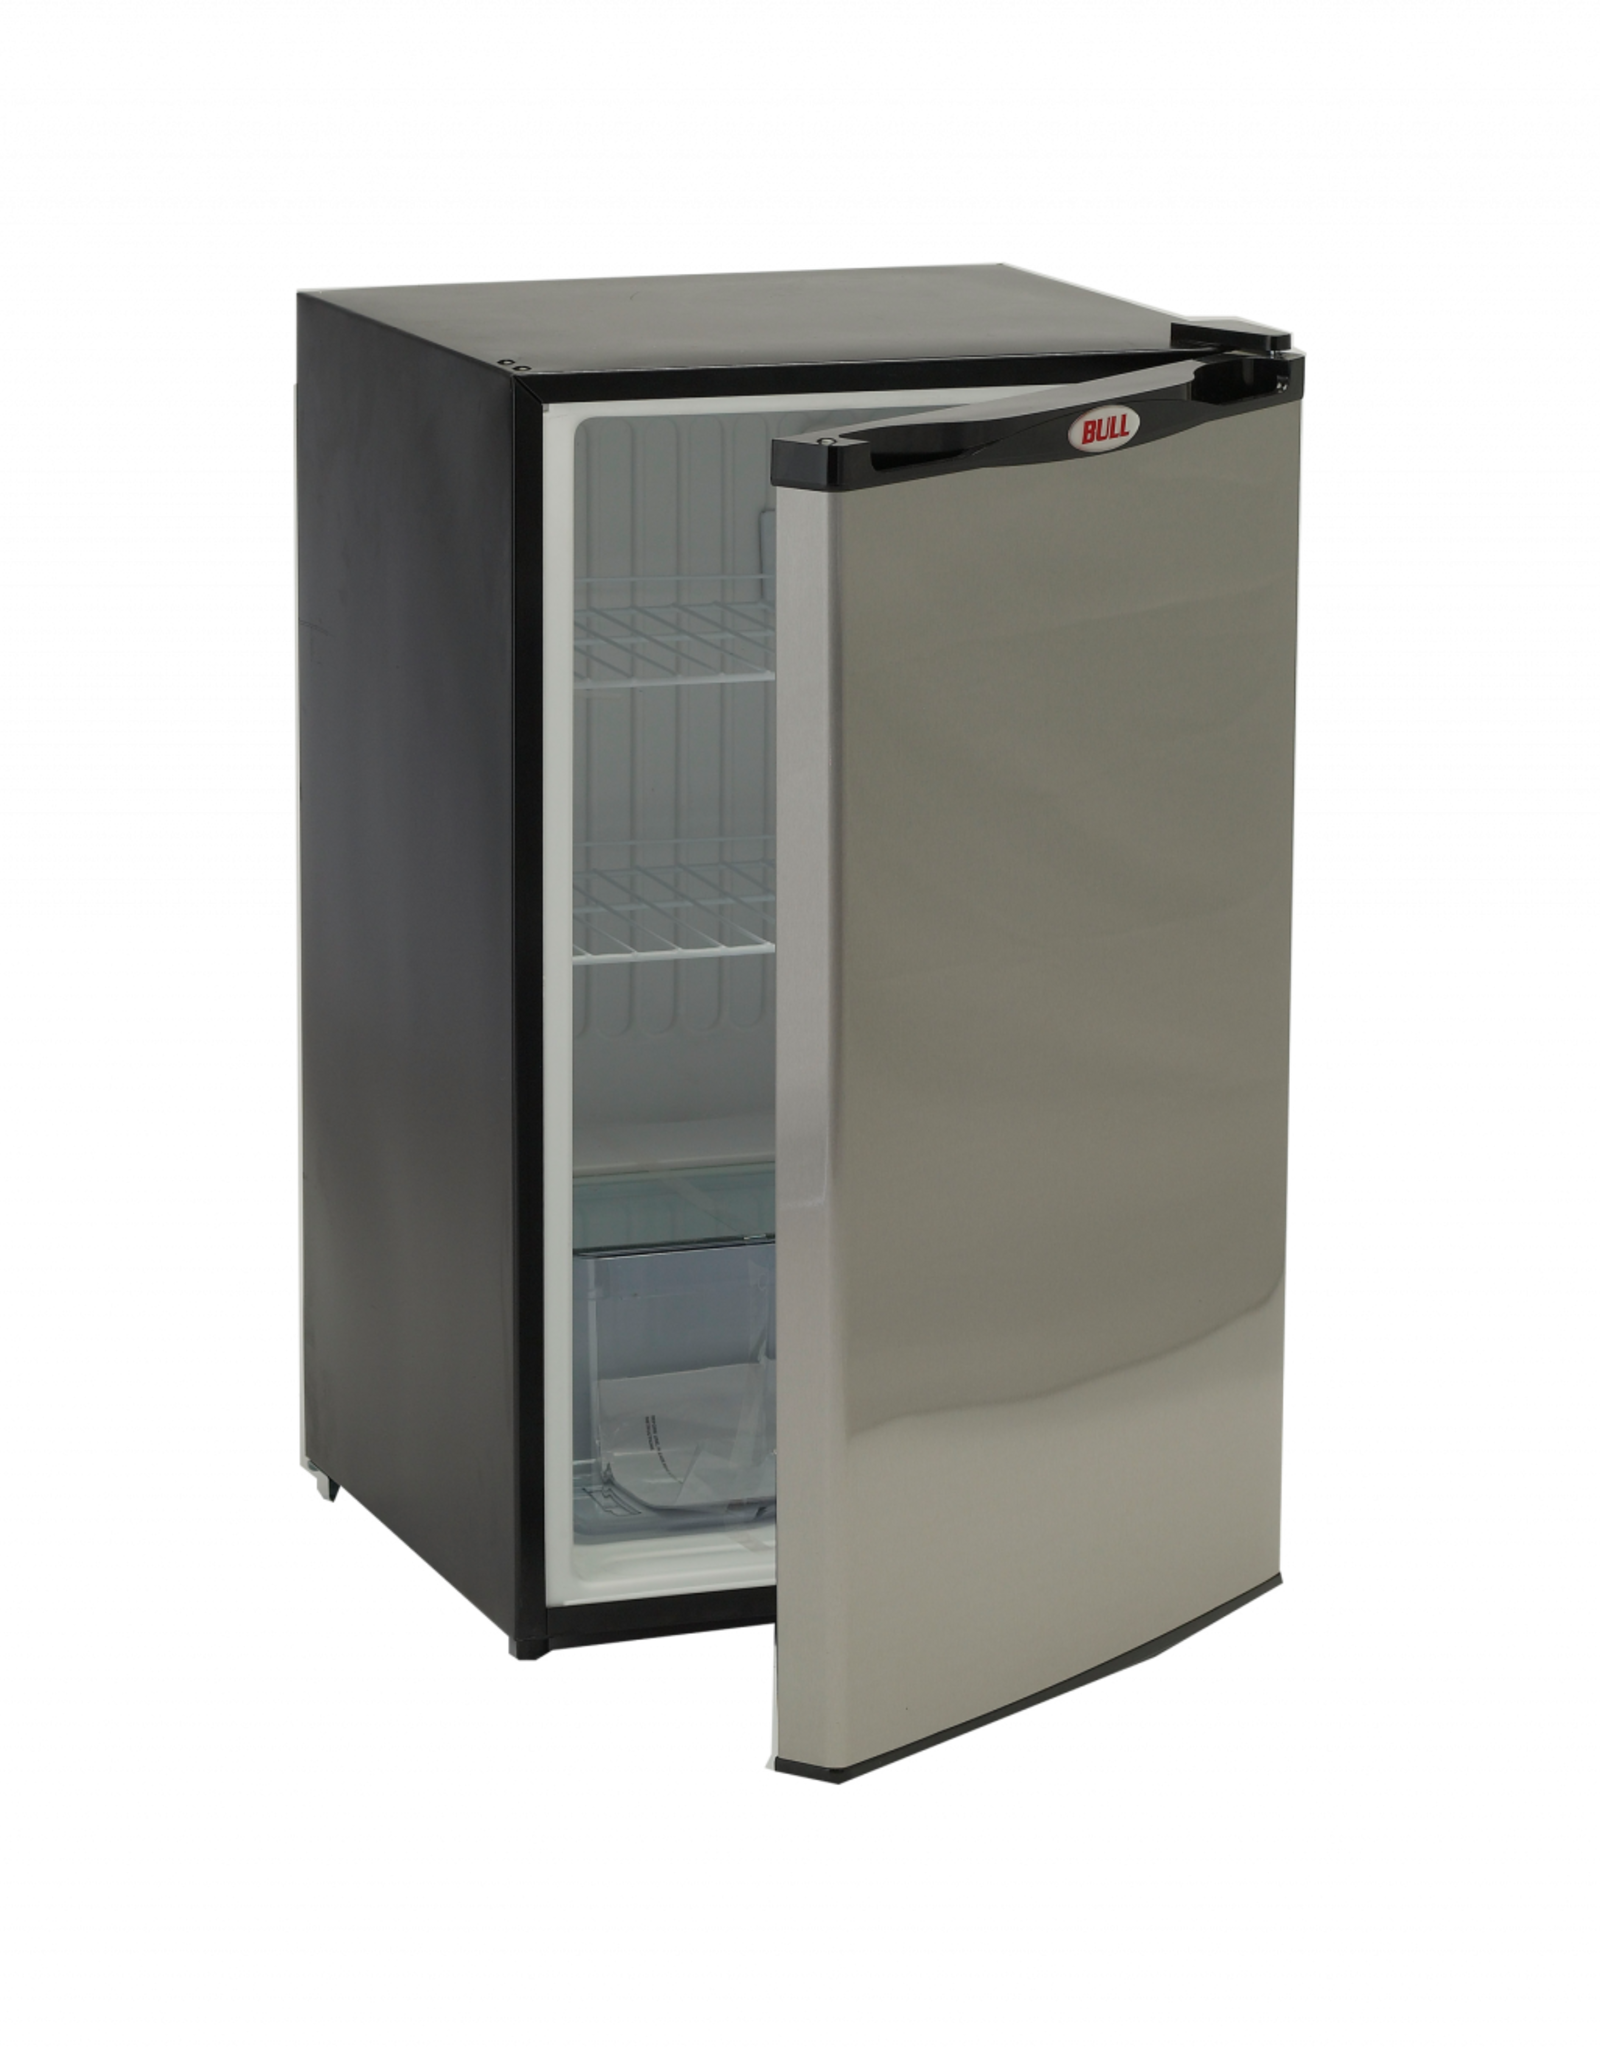 Bull Bull Standard Refrigerator 4.5 cu. ft. - 11001